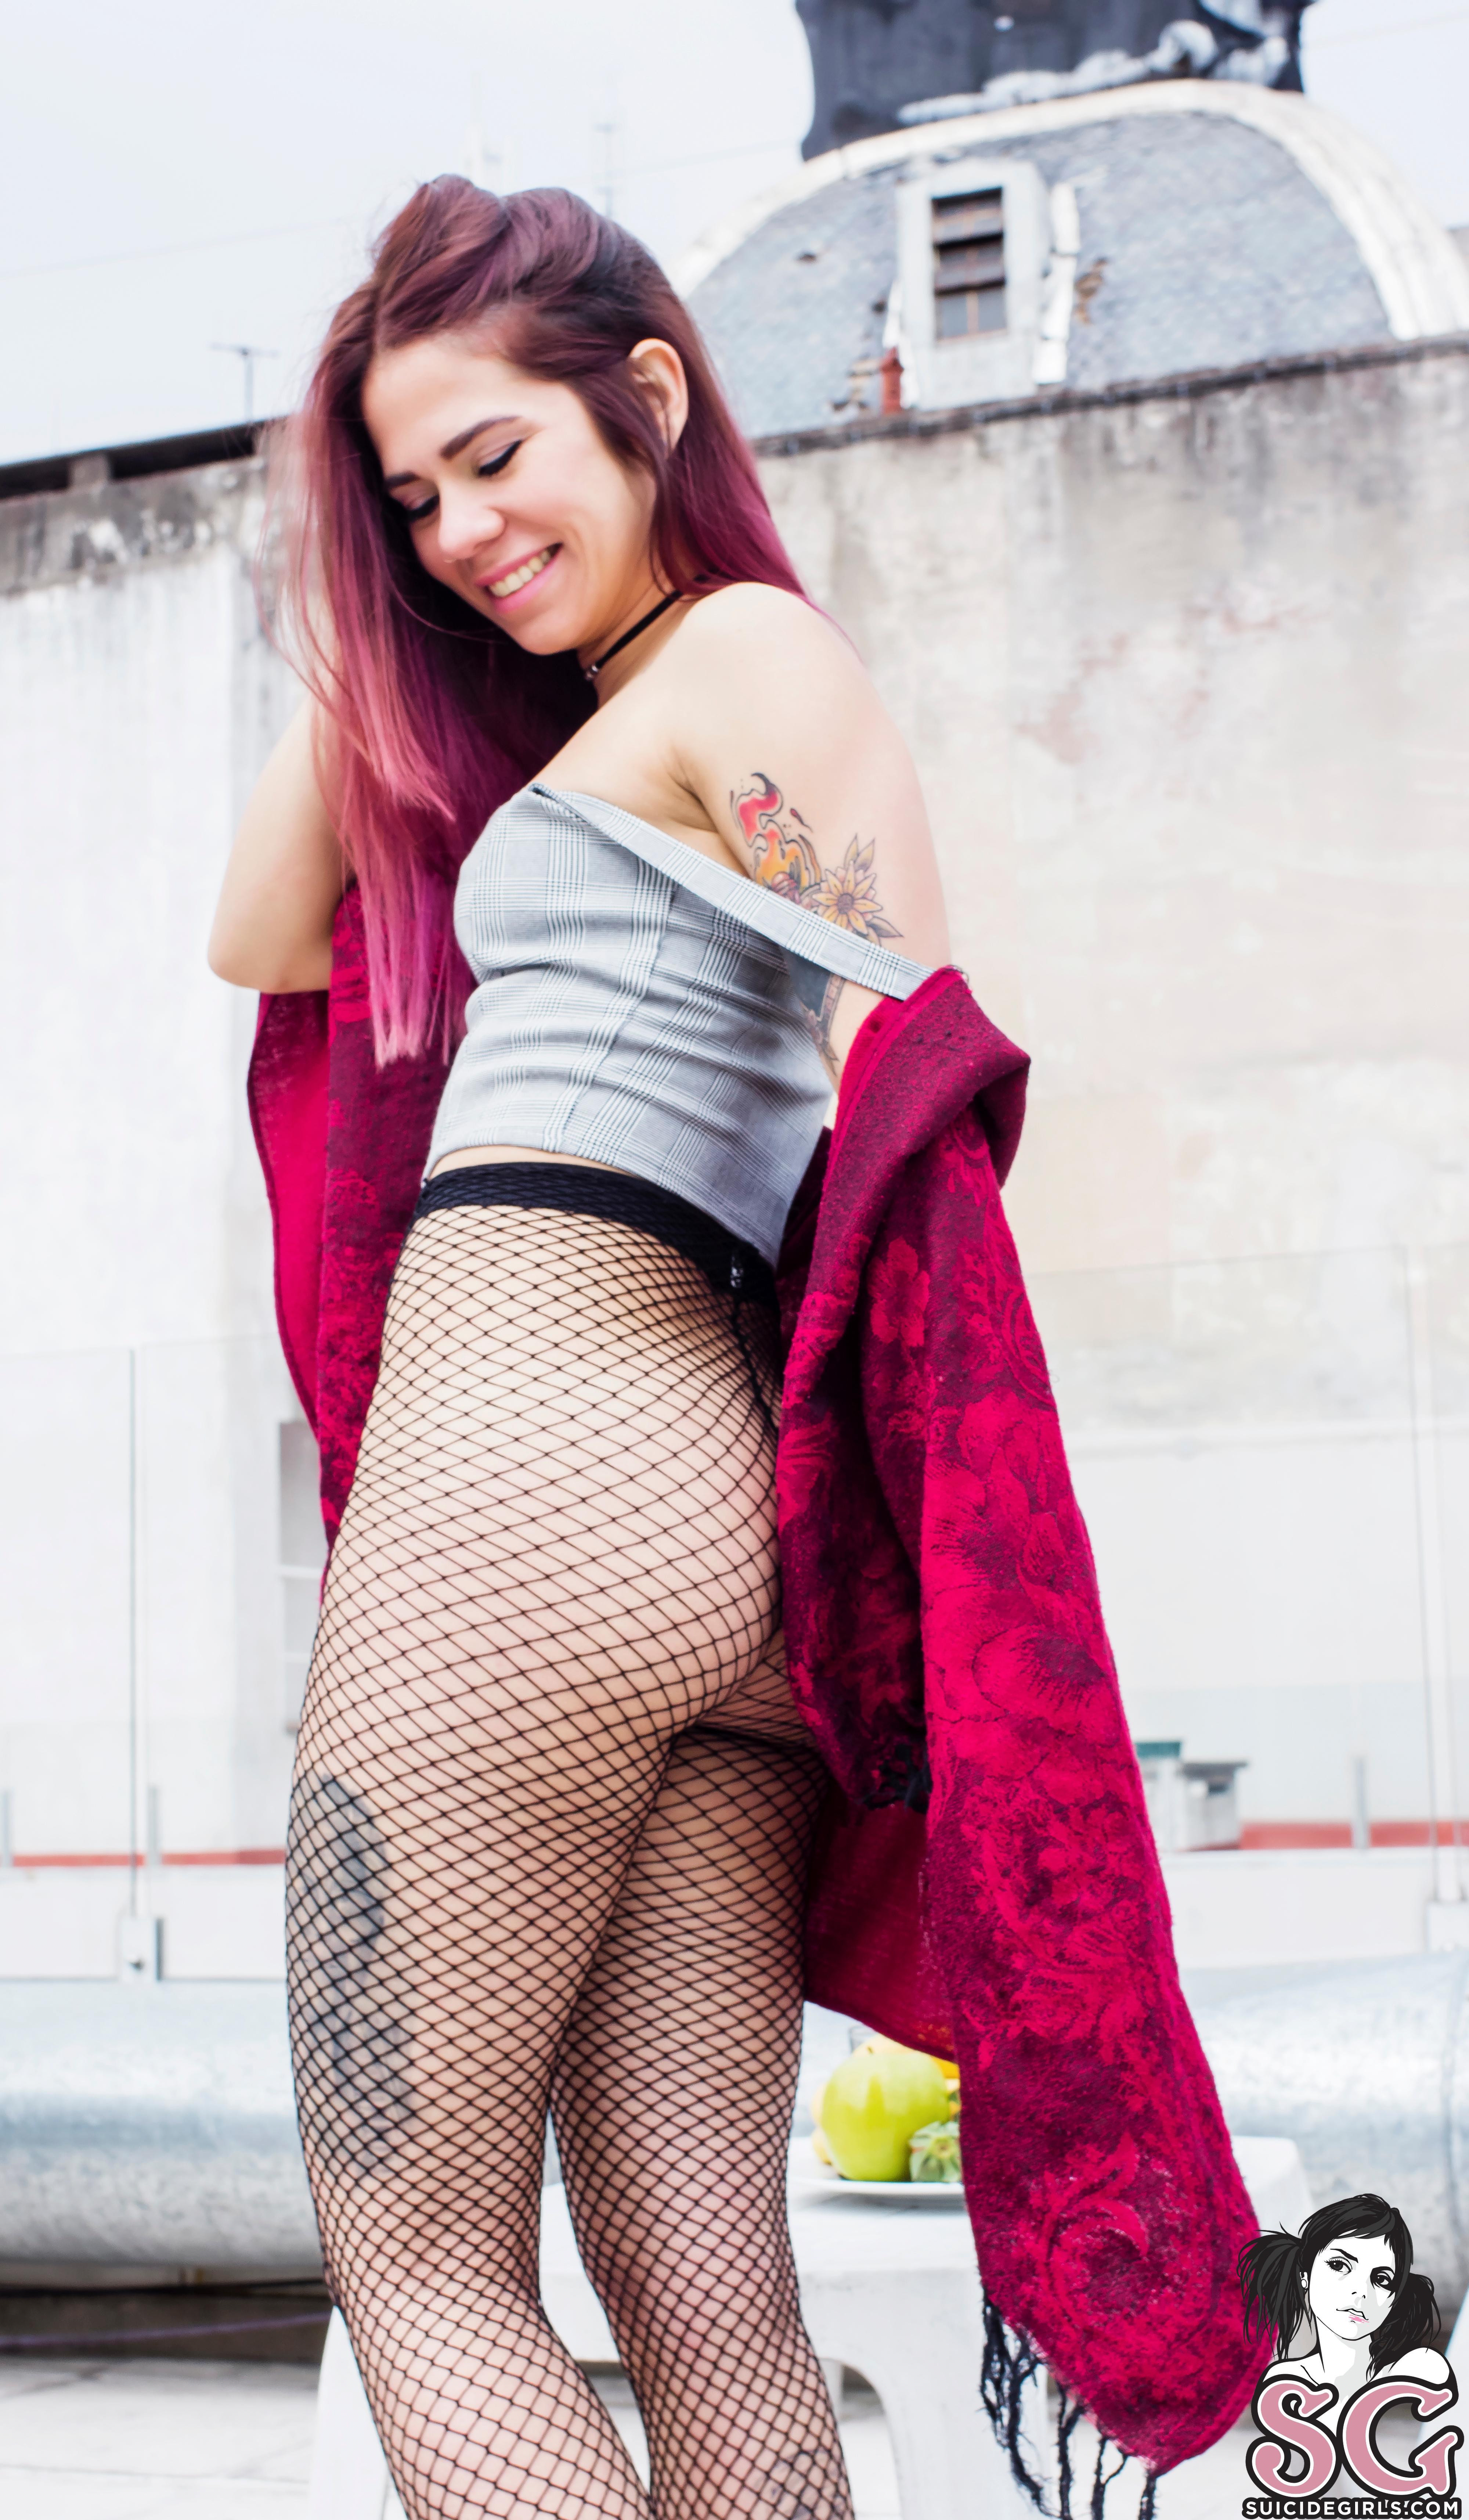 Suicidegirls Nude On Top  Siterip  Imageset 5200px  Multimirror